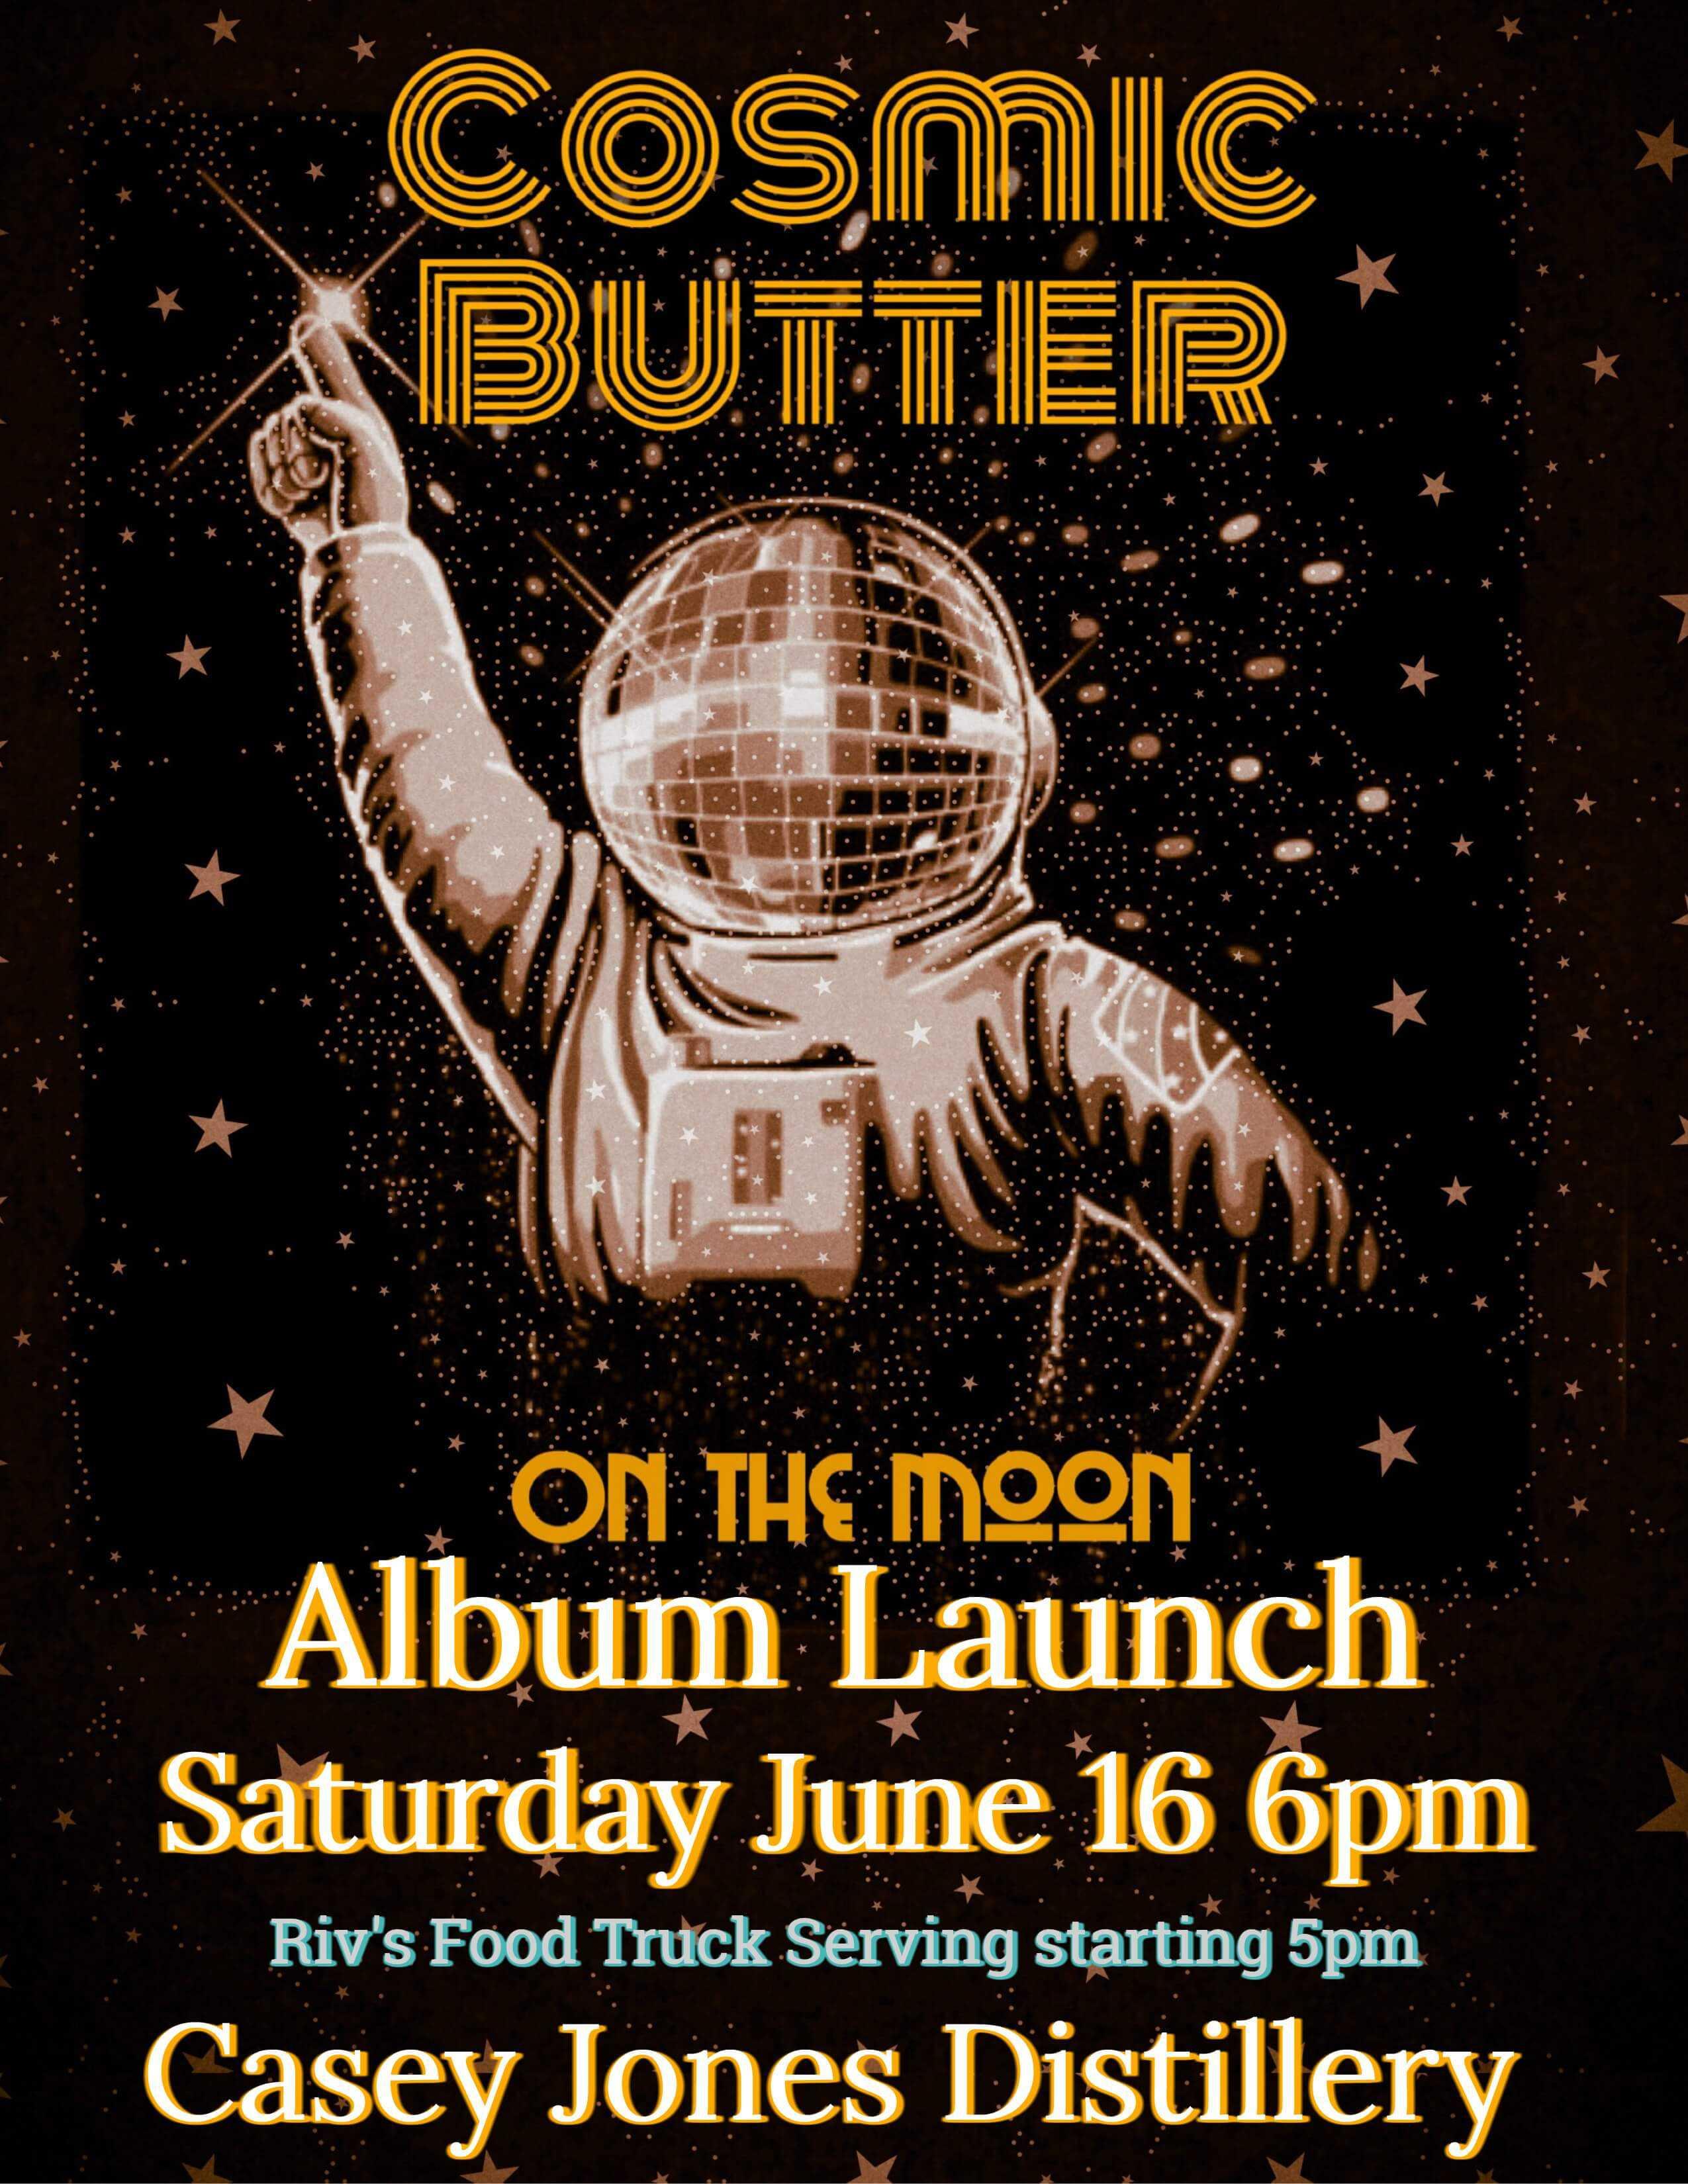 Cosmic Butter Poster 1 - Cosmic Butter Album Launch